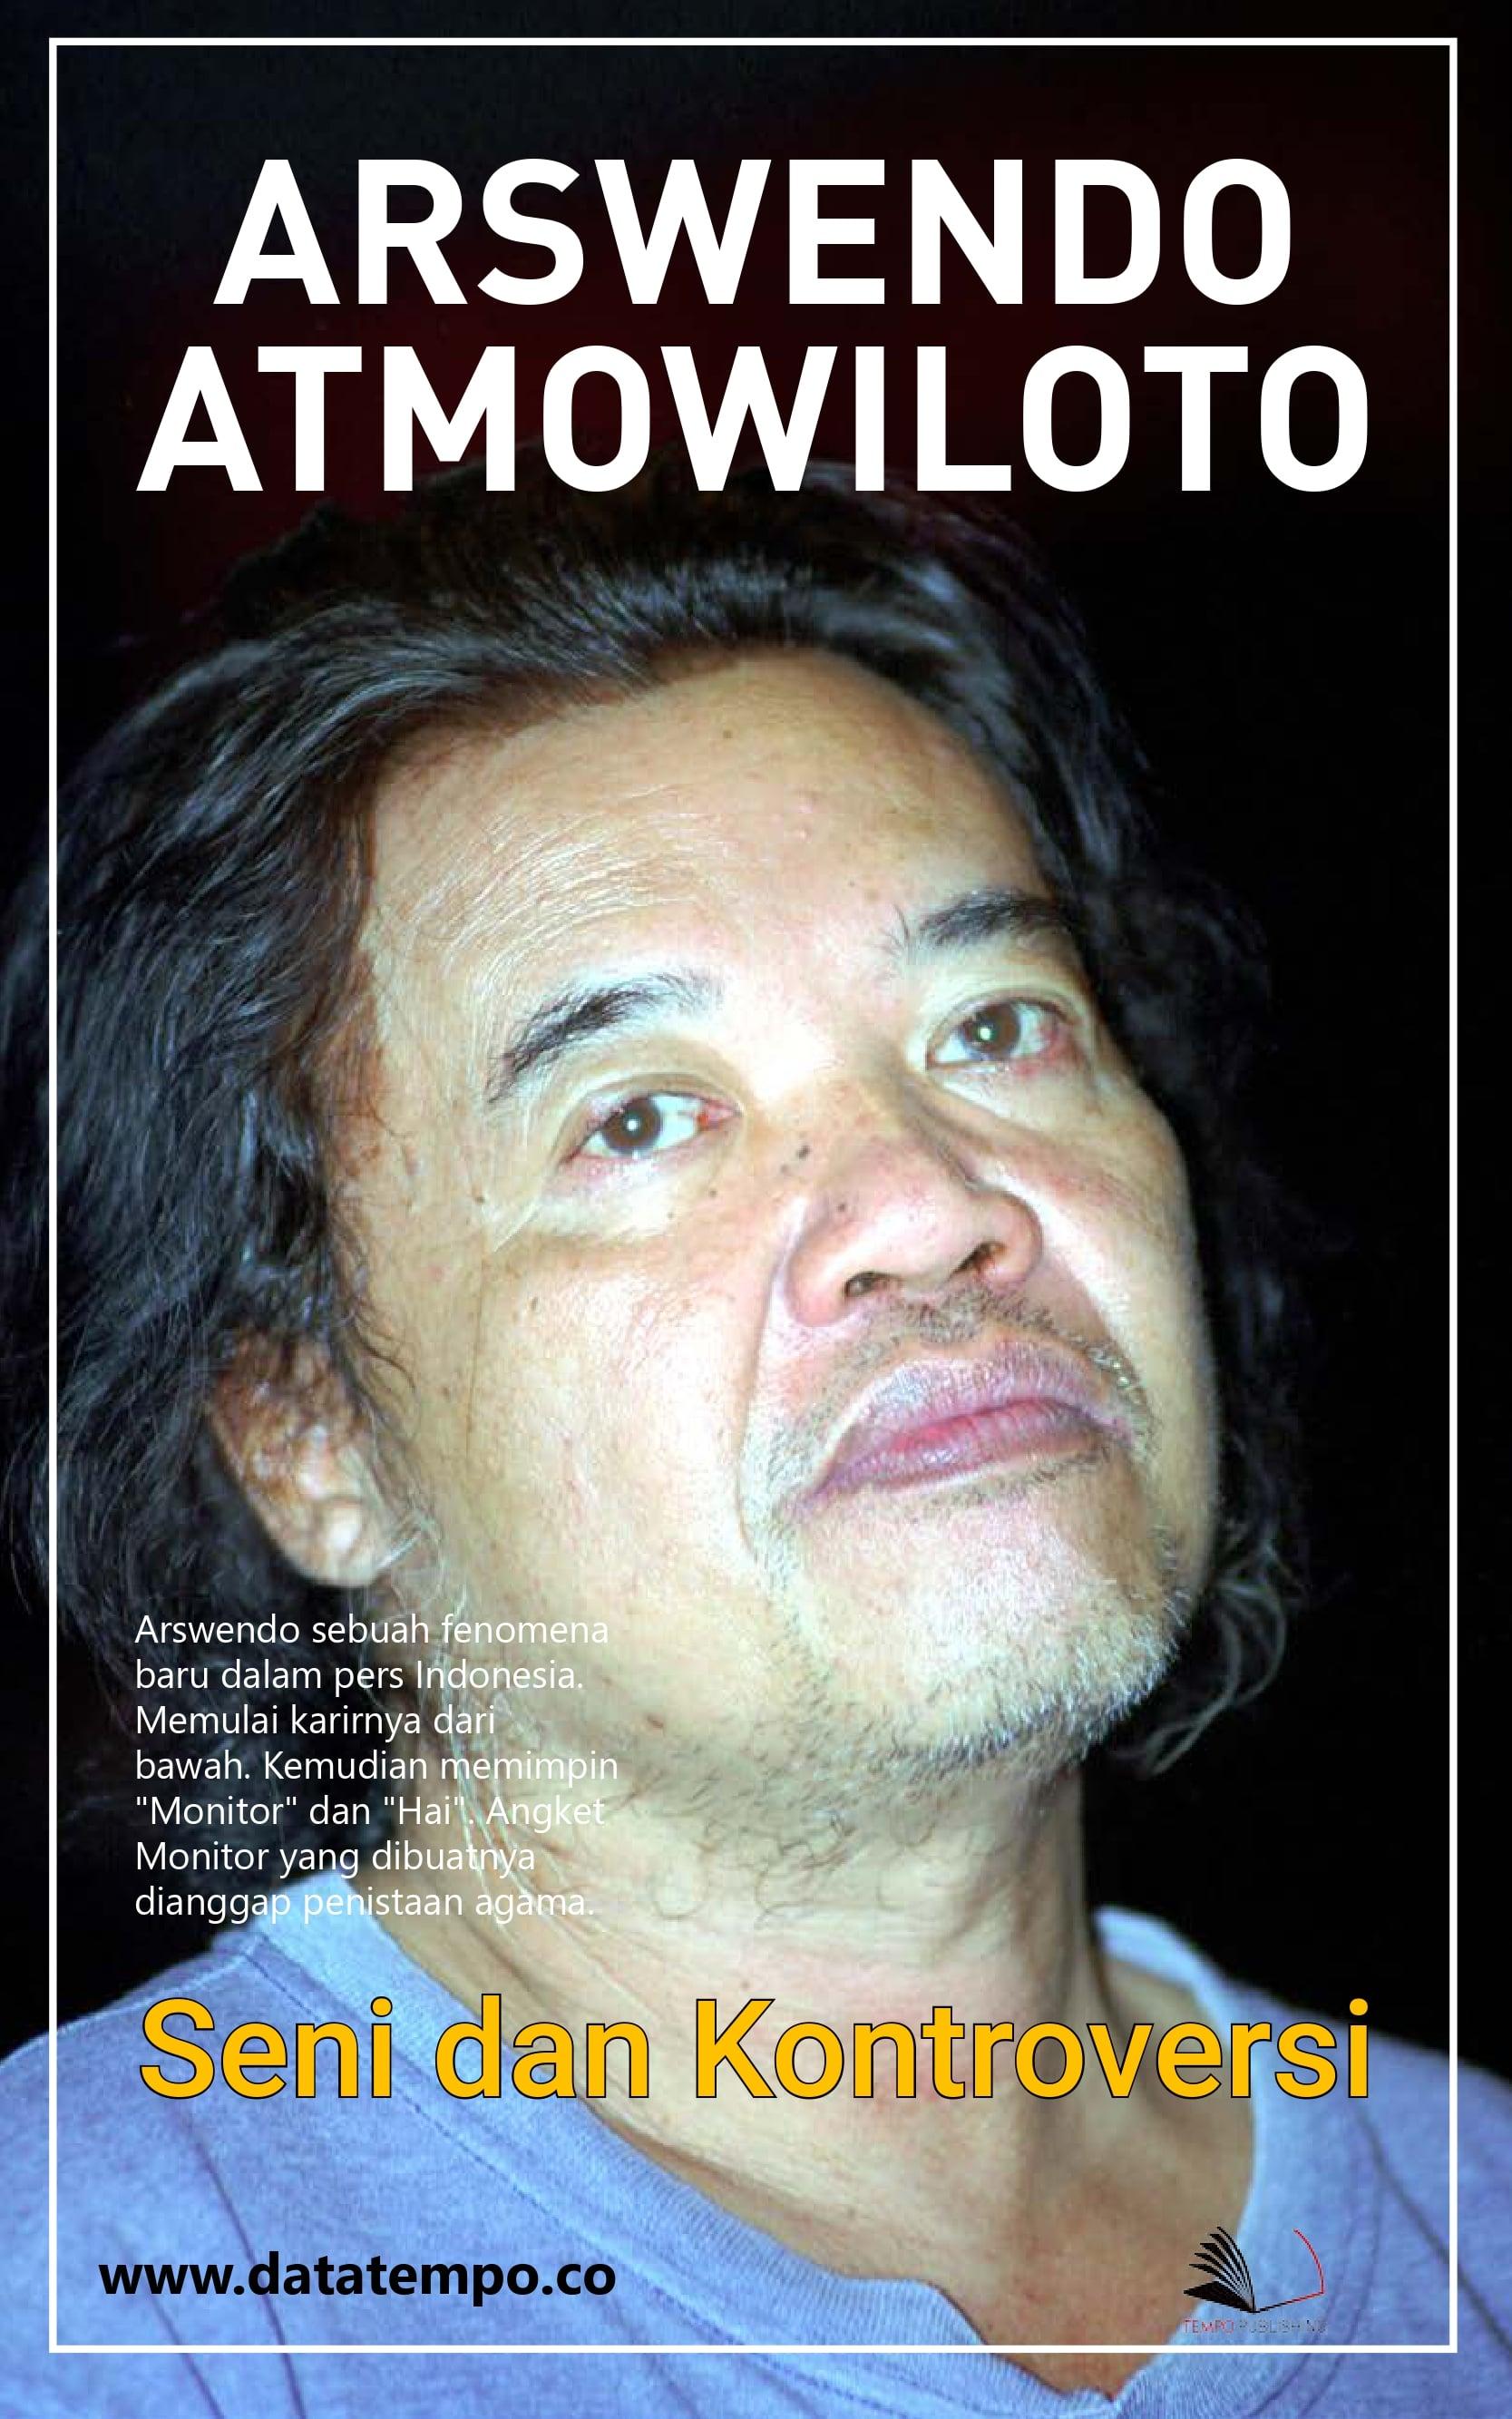 Arswendo Atmowiloto - seni dan kontroversi [sumber elektronis]